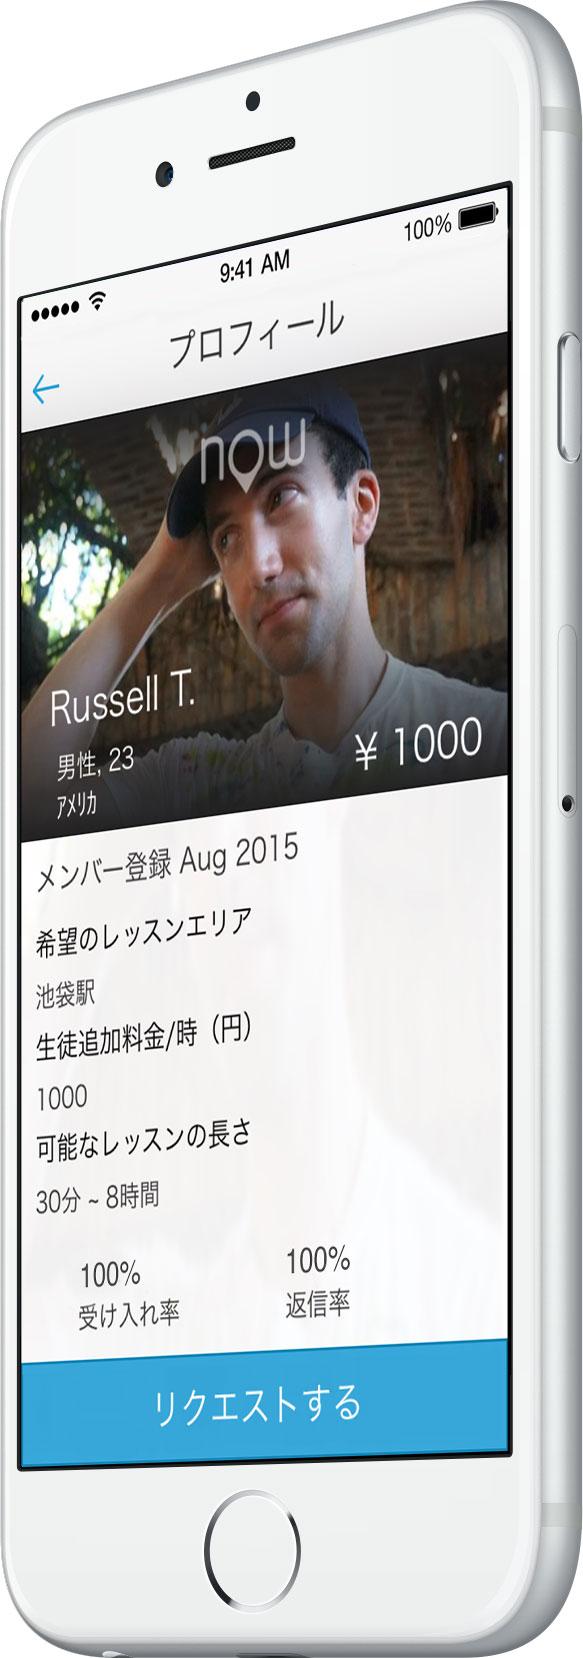 RussellT_side.jpg